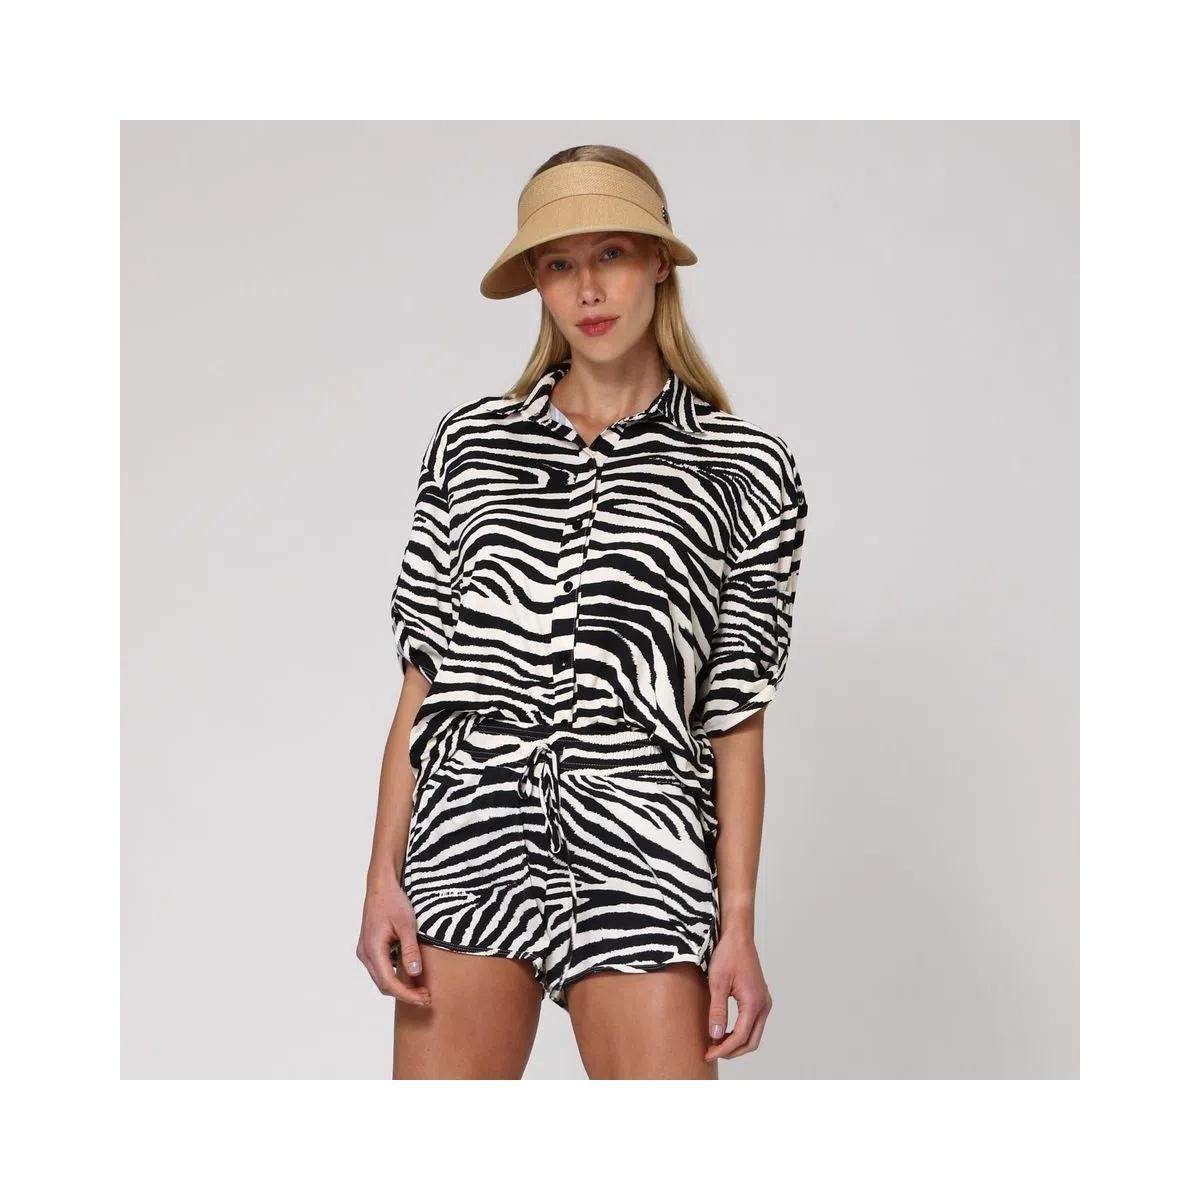 UV LINE Camisa Zebra Feminina Manga Curta Branco/Preto Proteção Solar